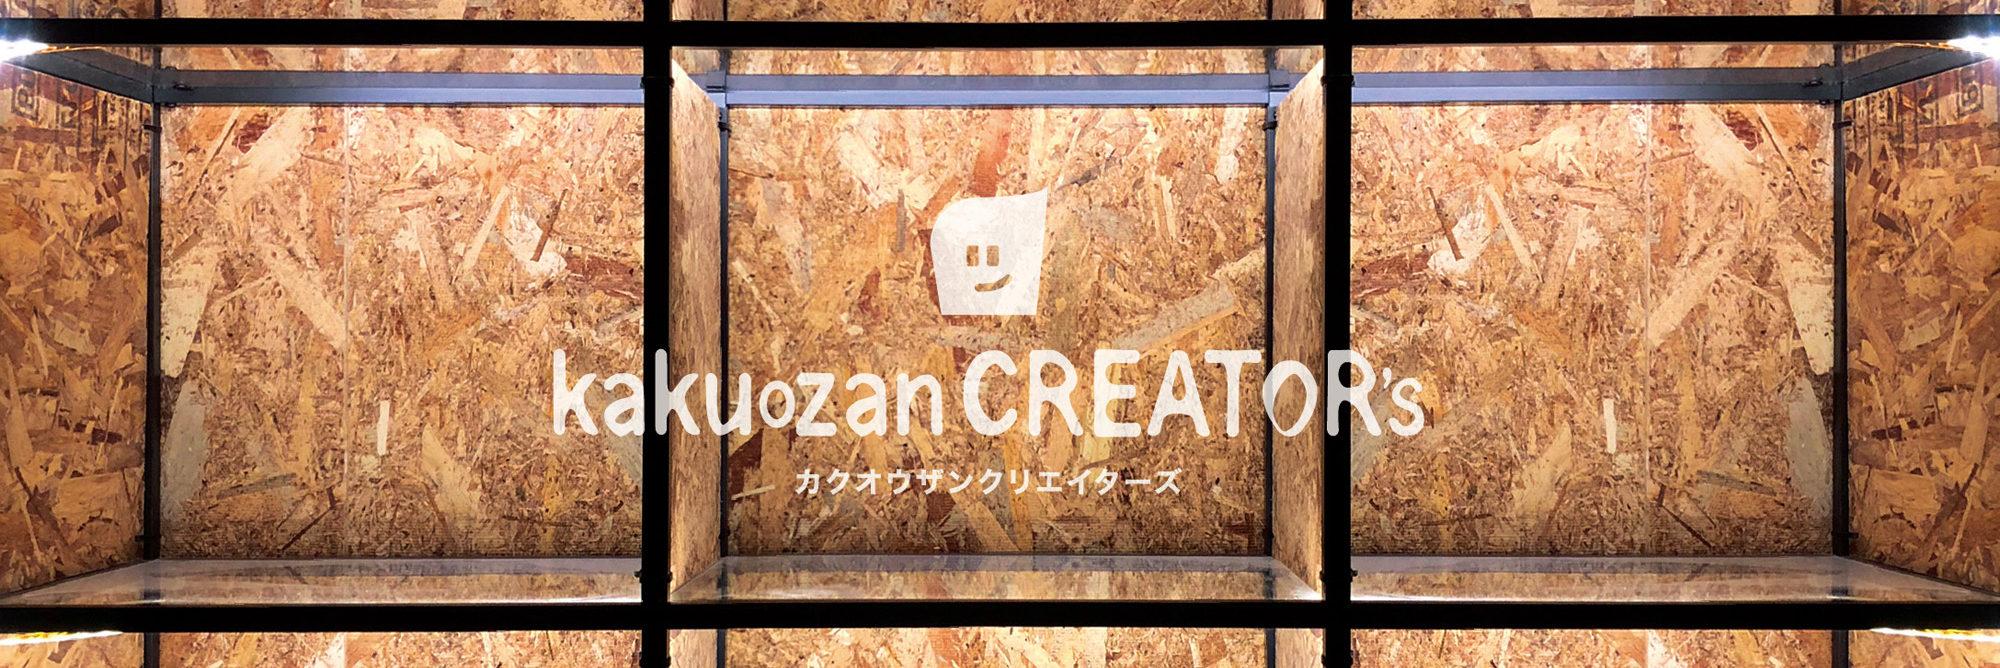 BOX gallery kakuozan CREATOR's